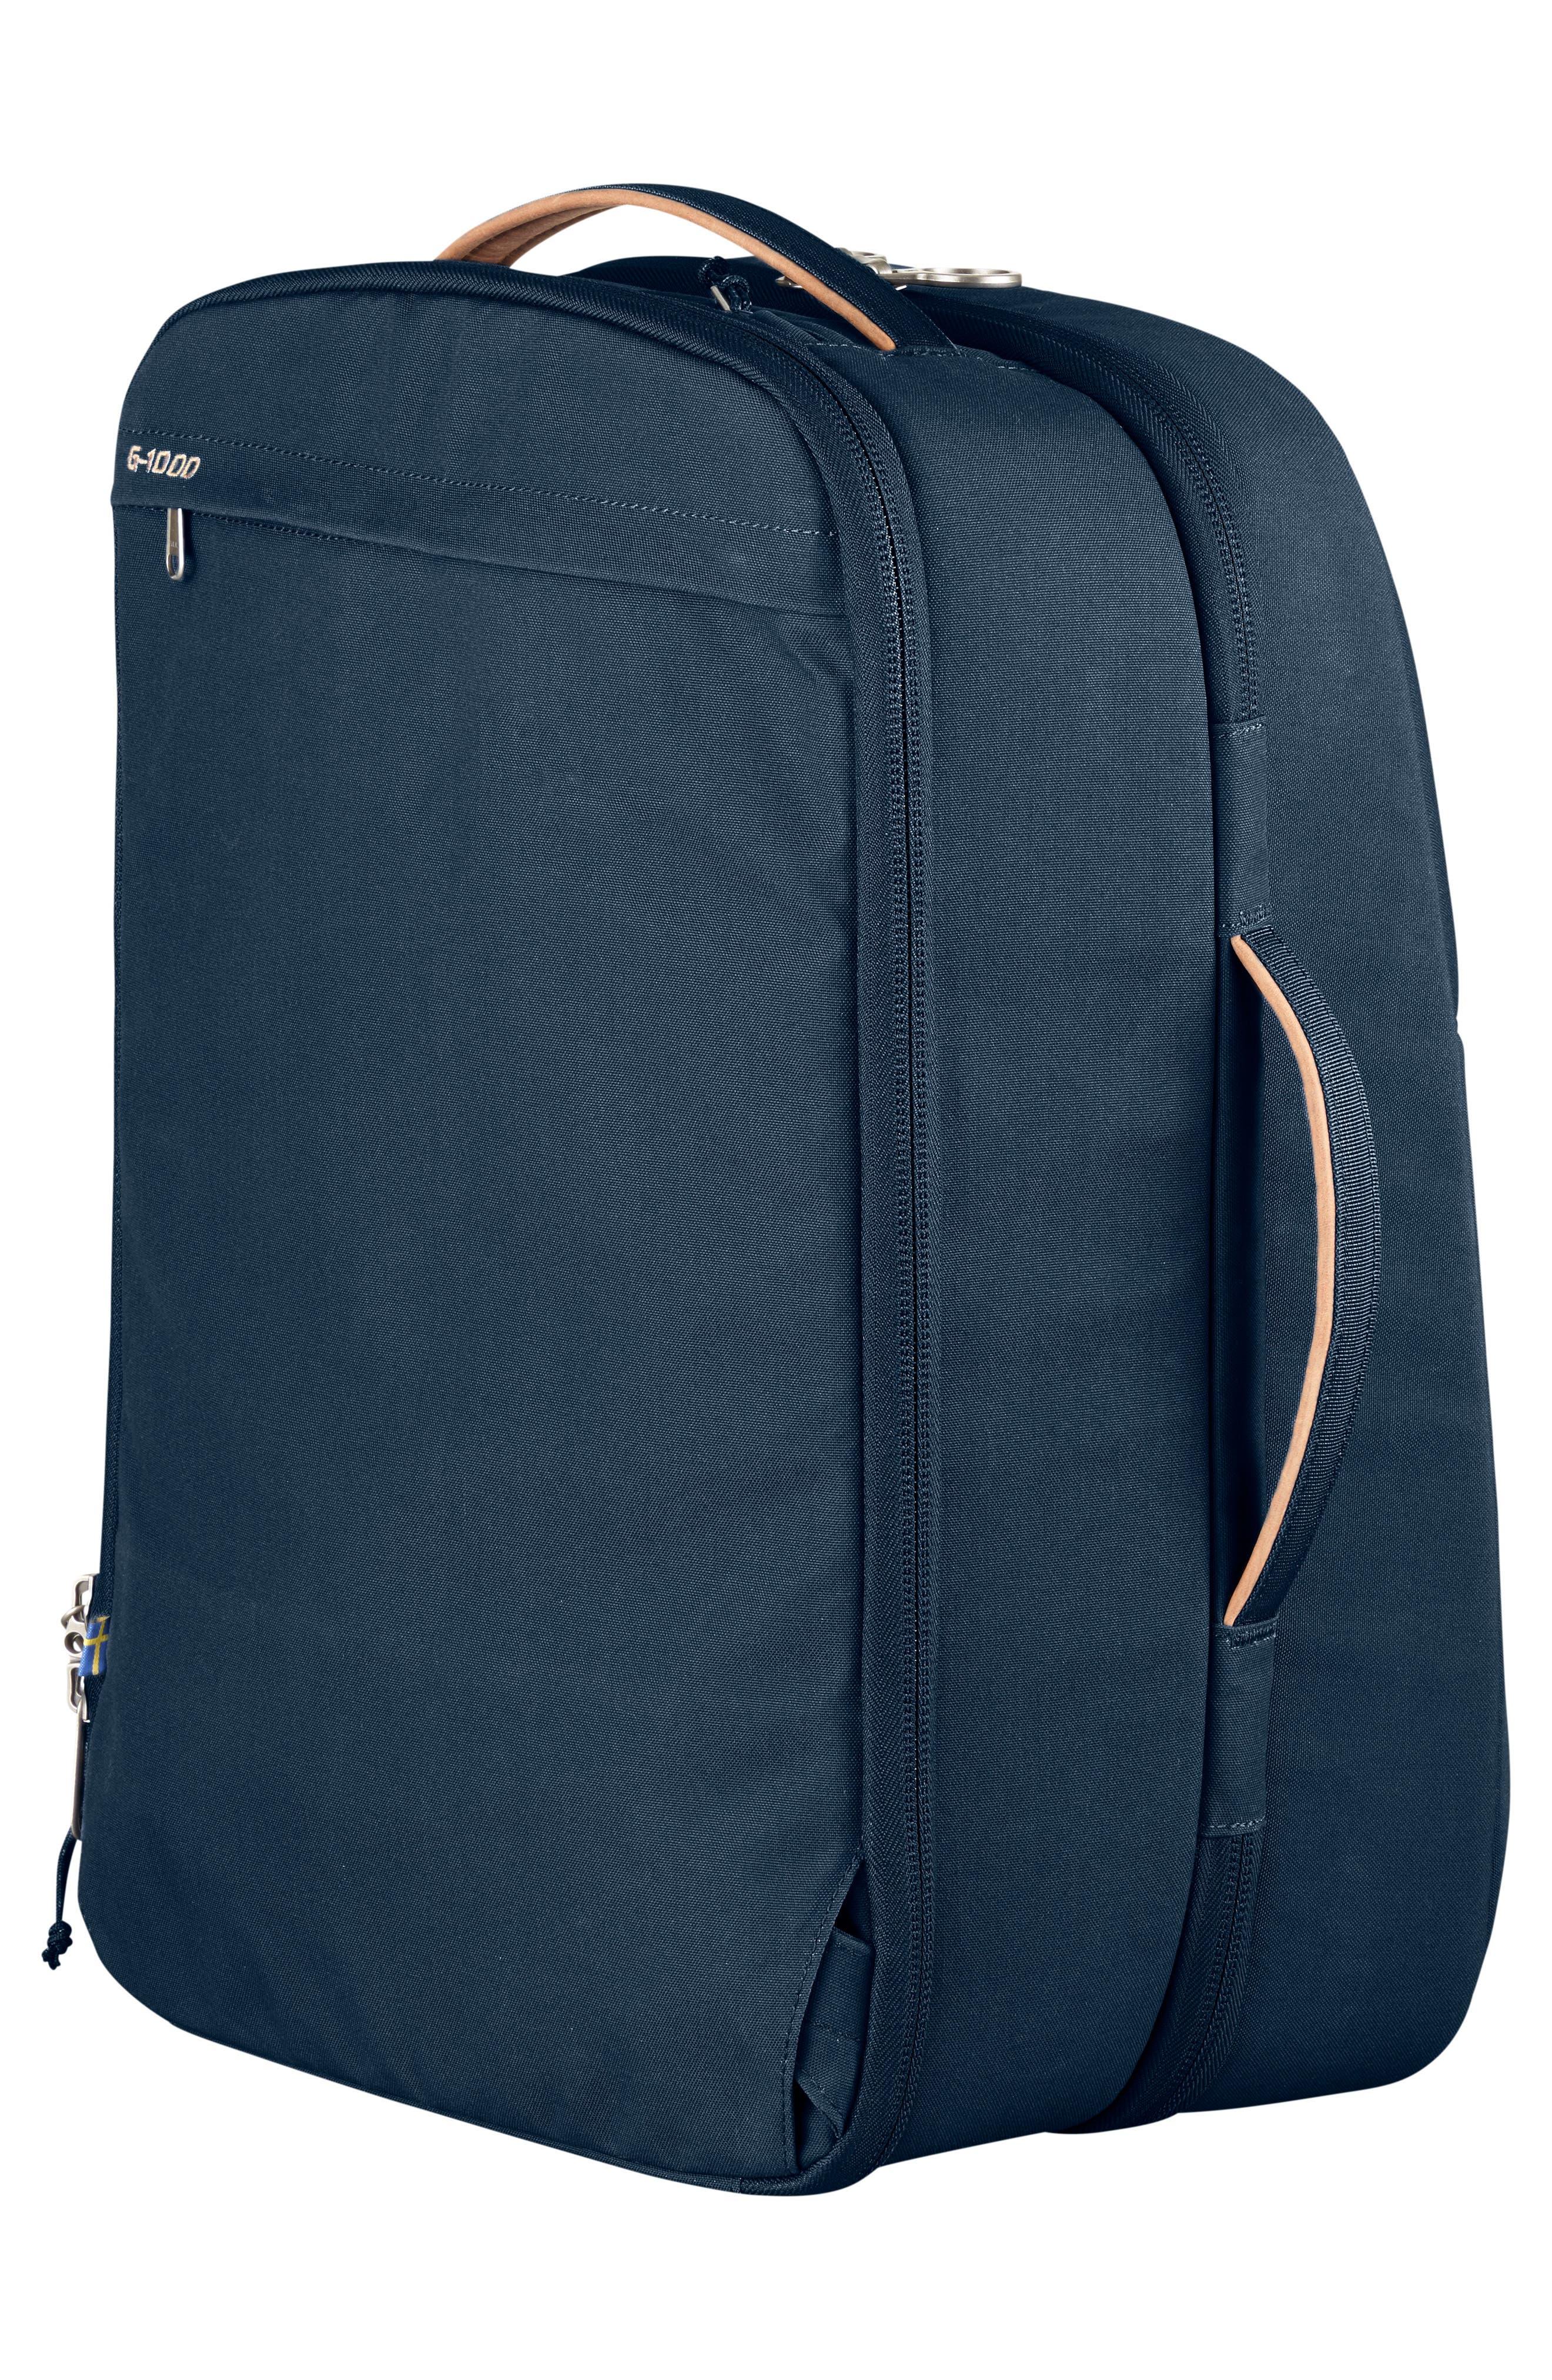 Travel Backpack,                             Alternate thumbnail 2, color,                             Navy